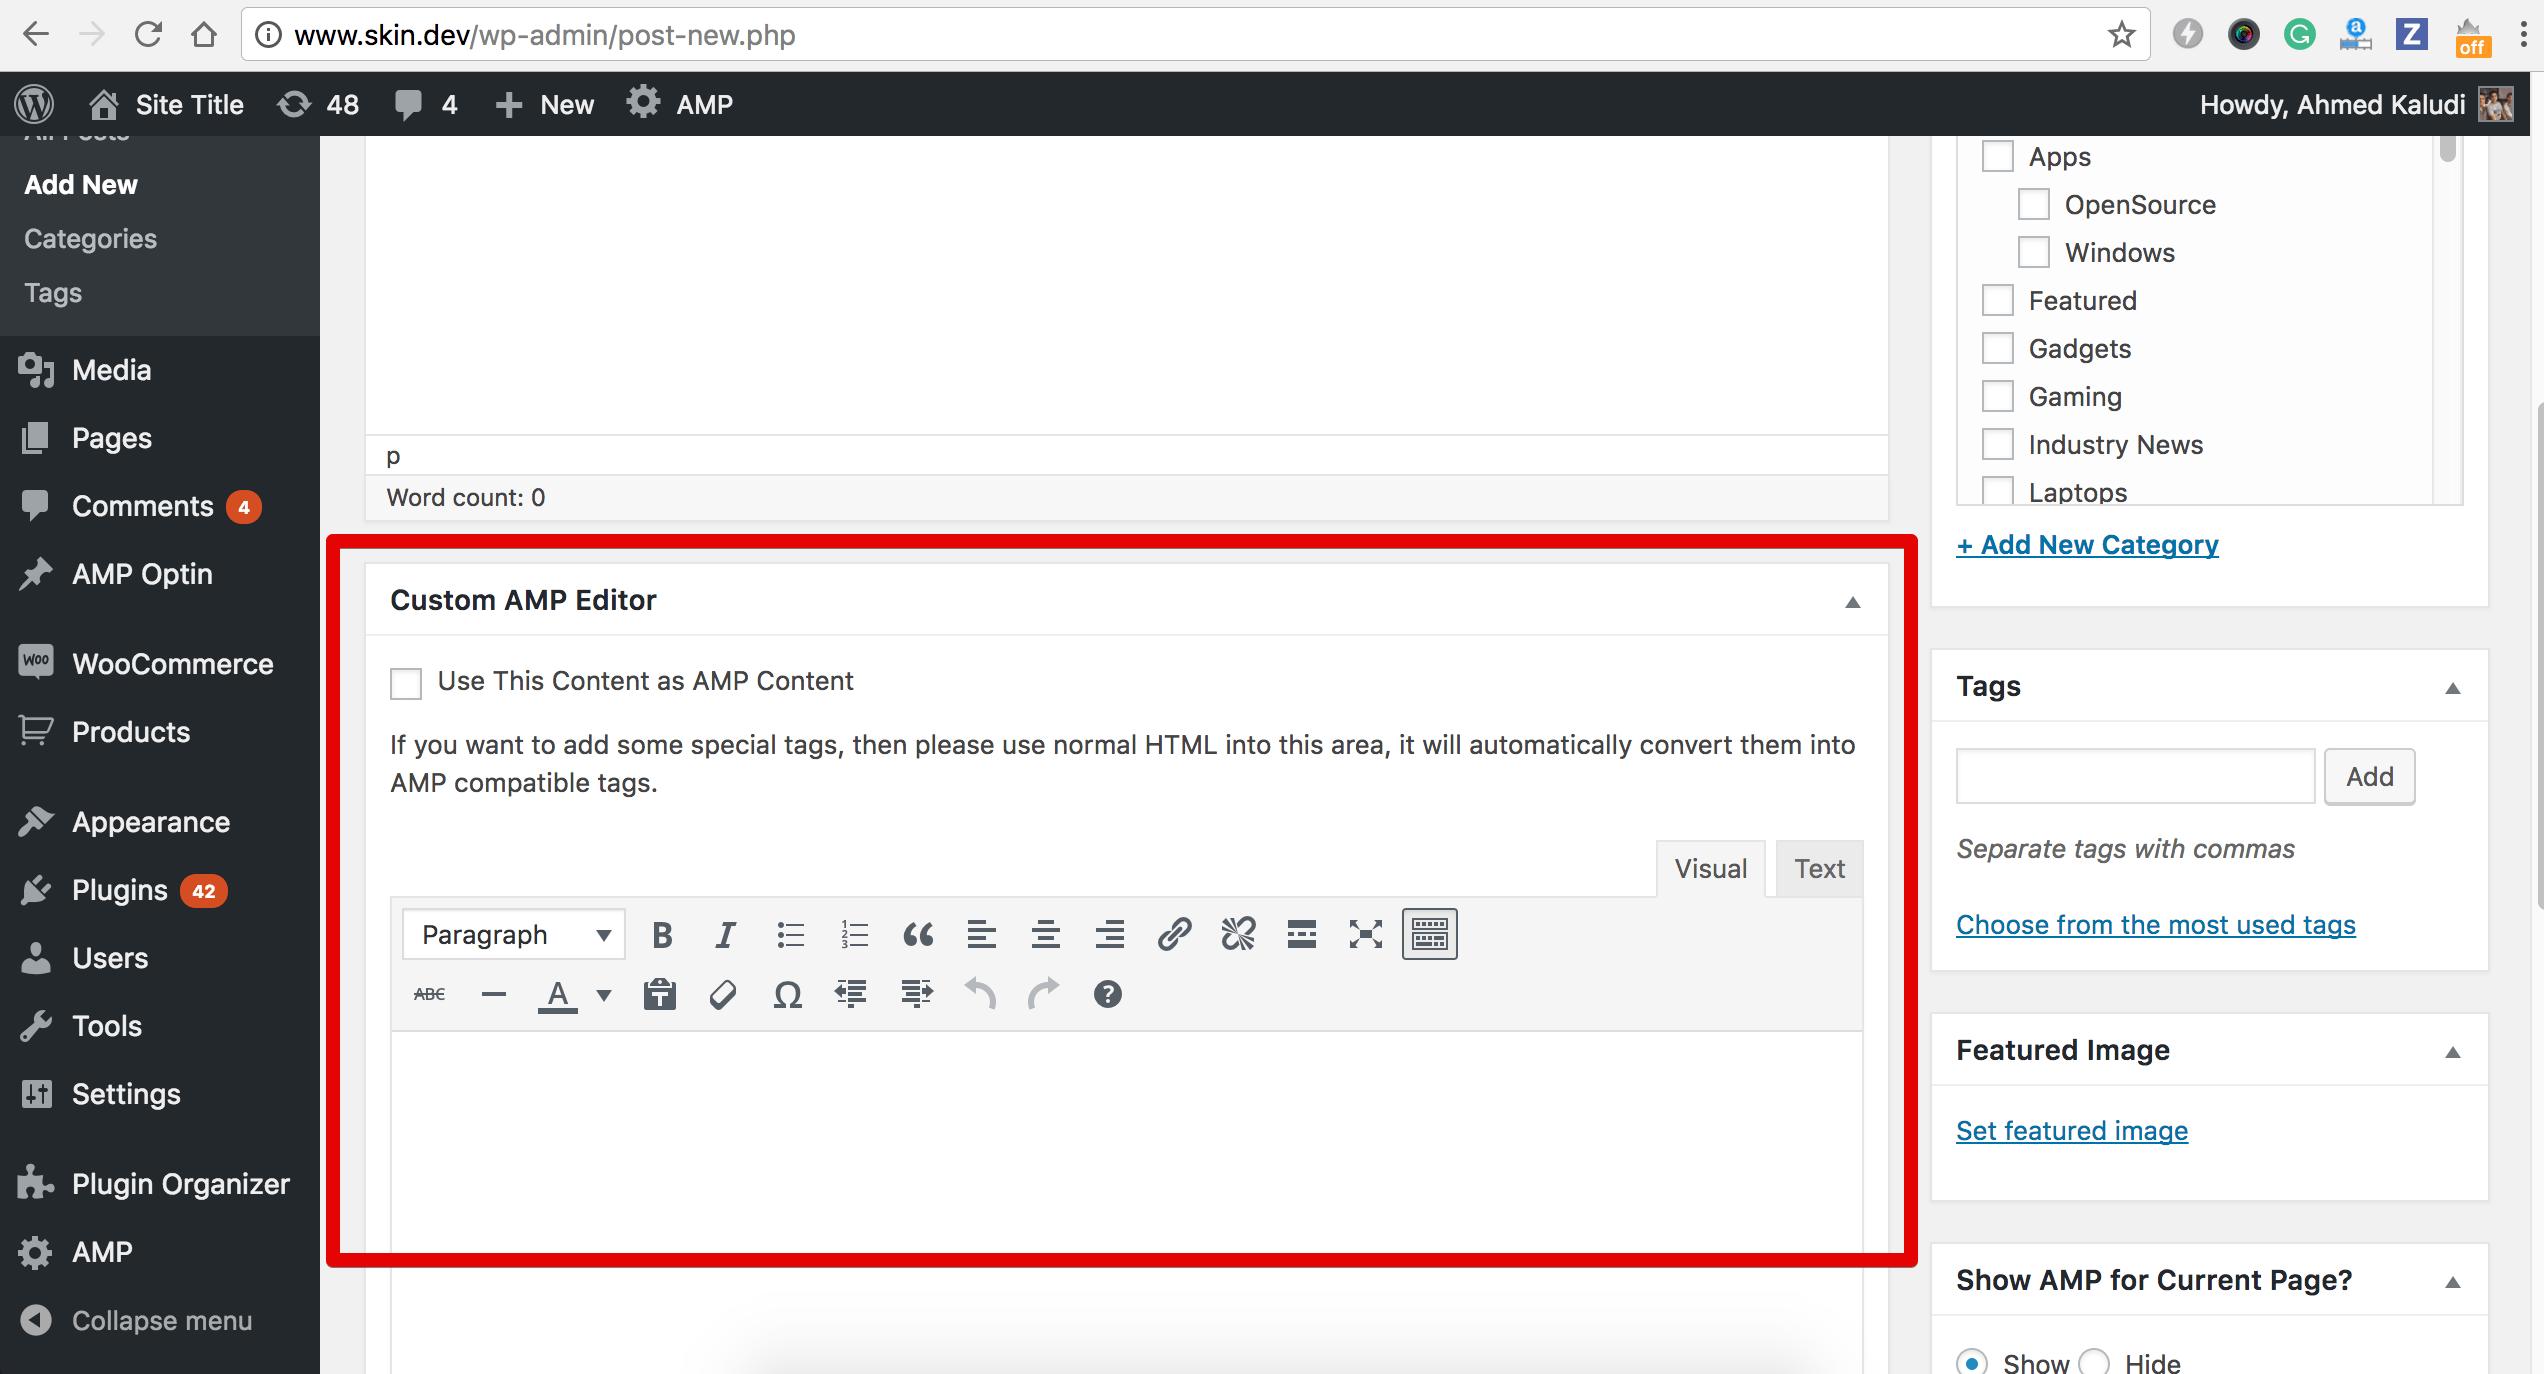 Custom AMP editor